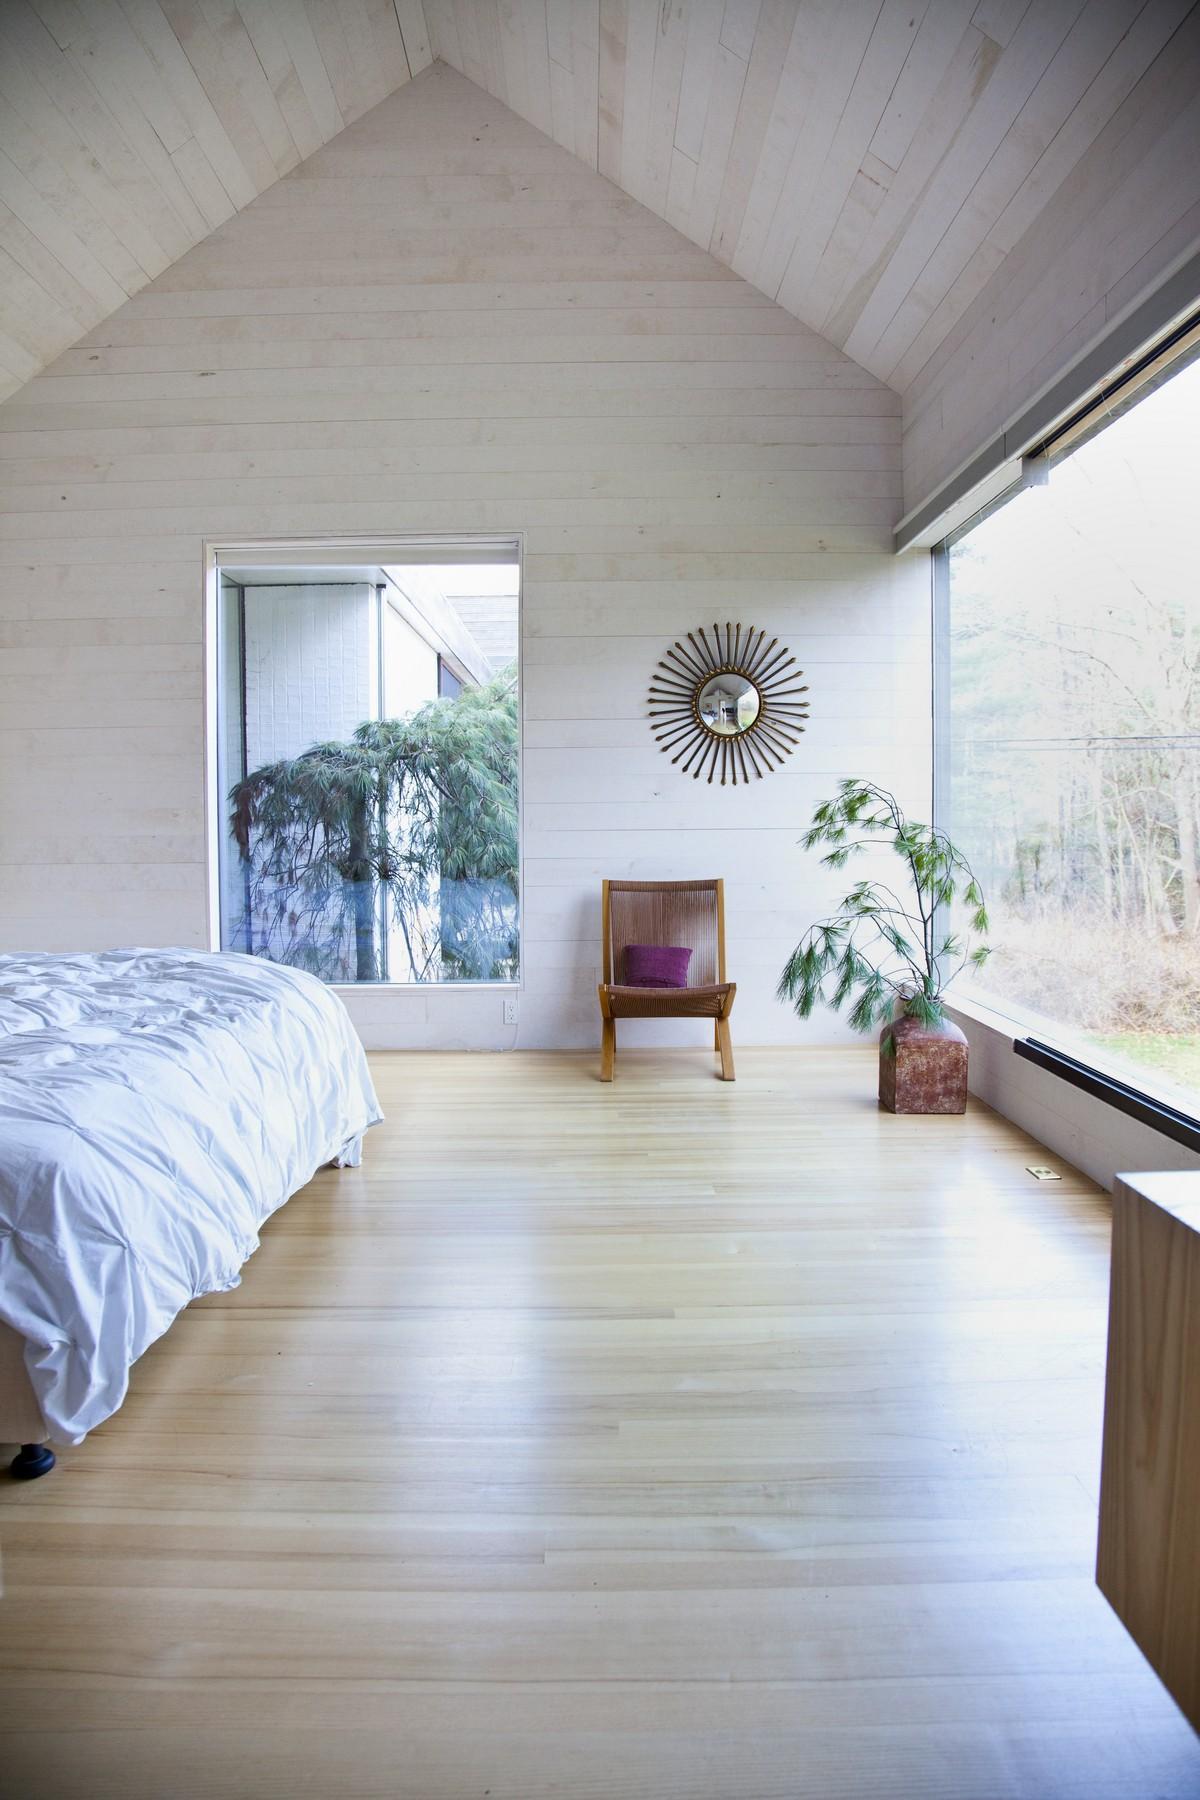 Bedroom, Large Windows, Rural Retreat in Bantam, Connecticut